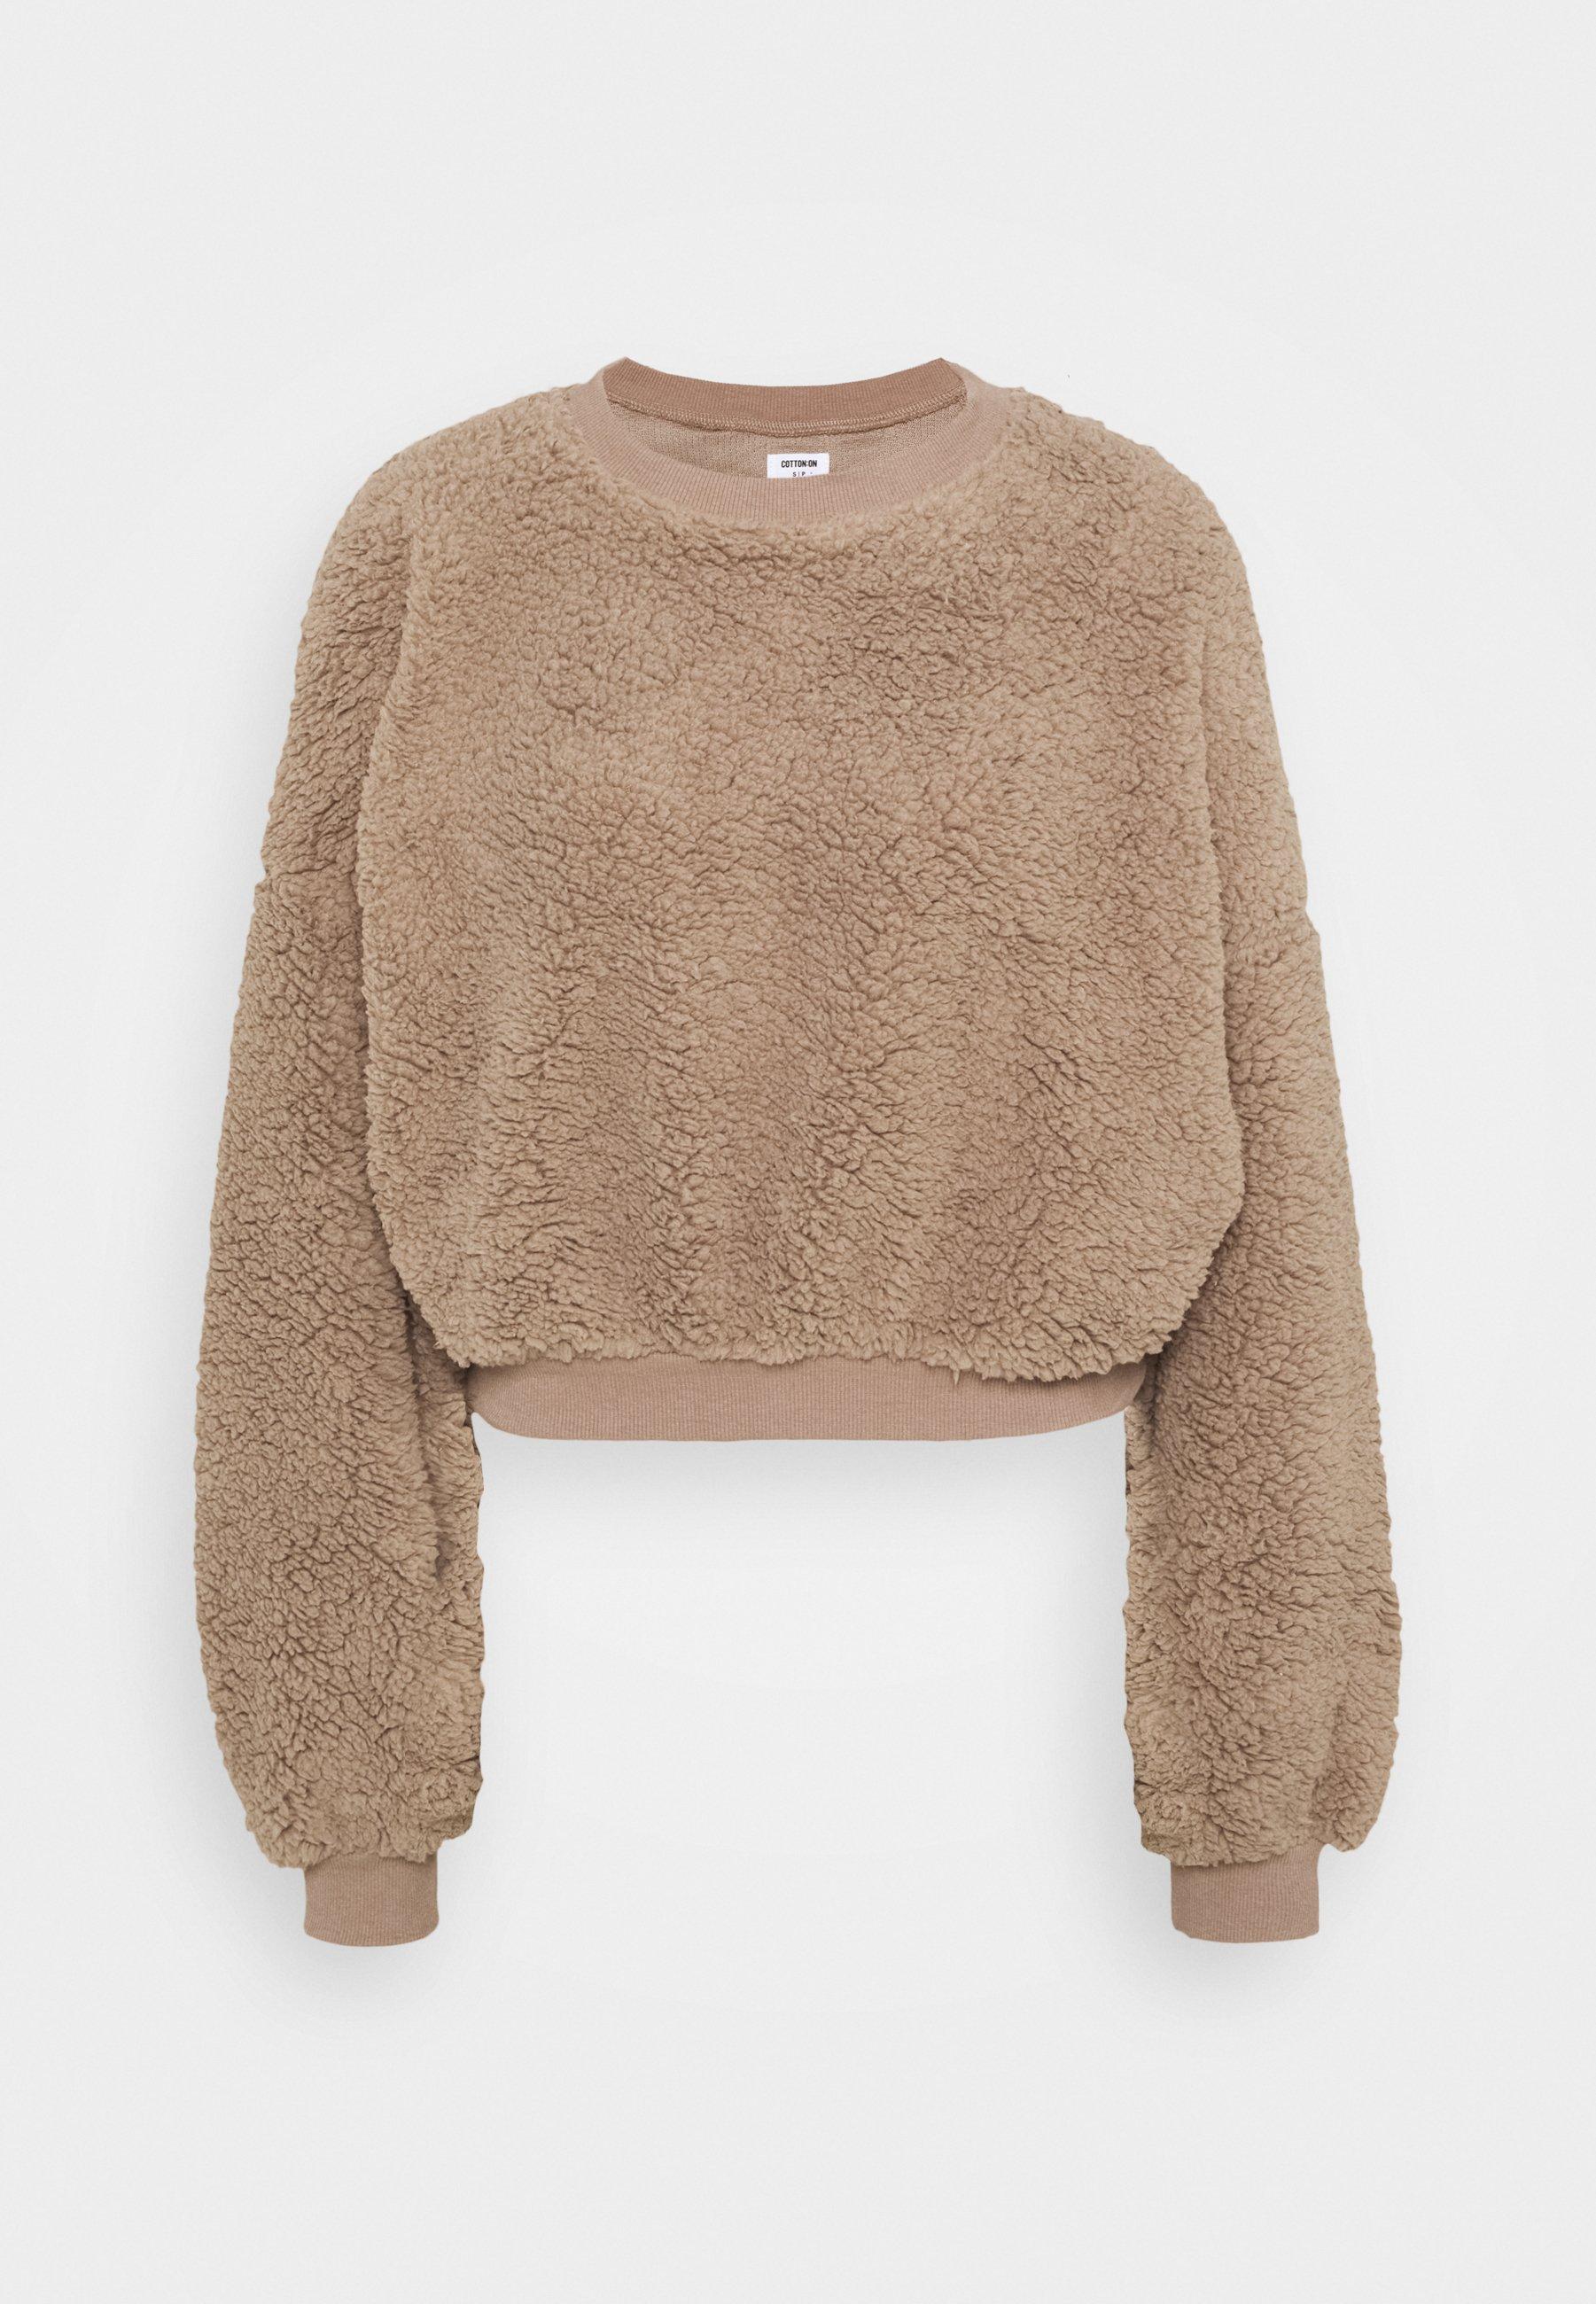 New Look TEDDY 12 ZIP Fleece trui camelcamel Zalando.nl